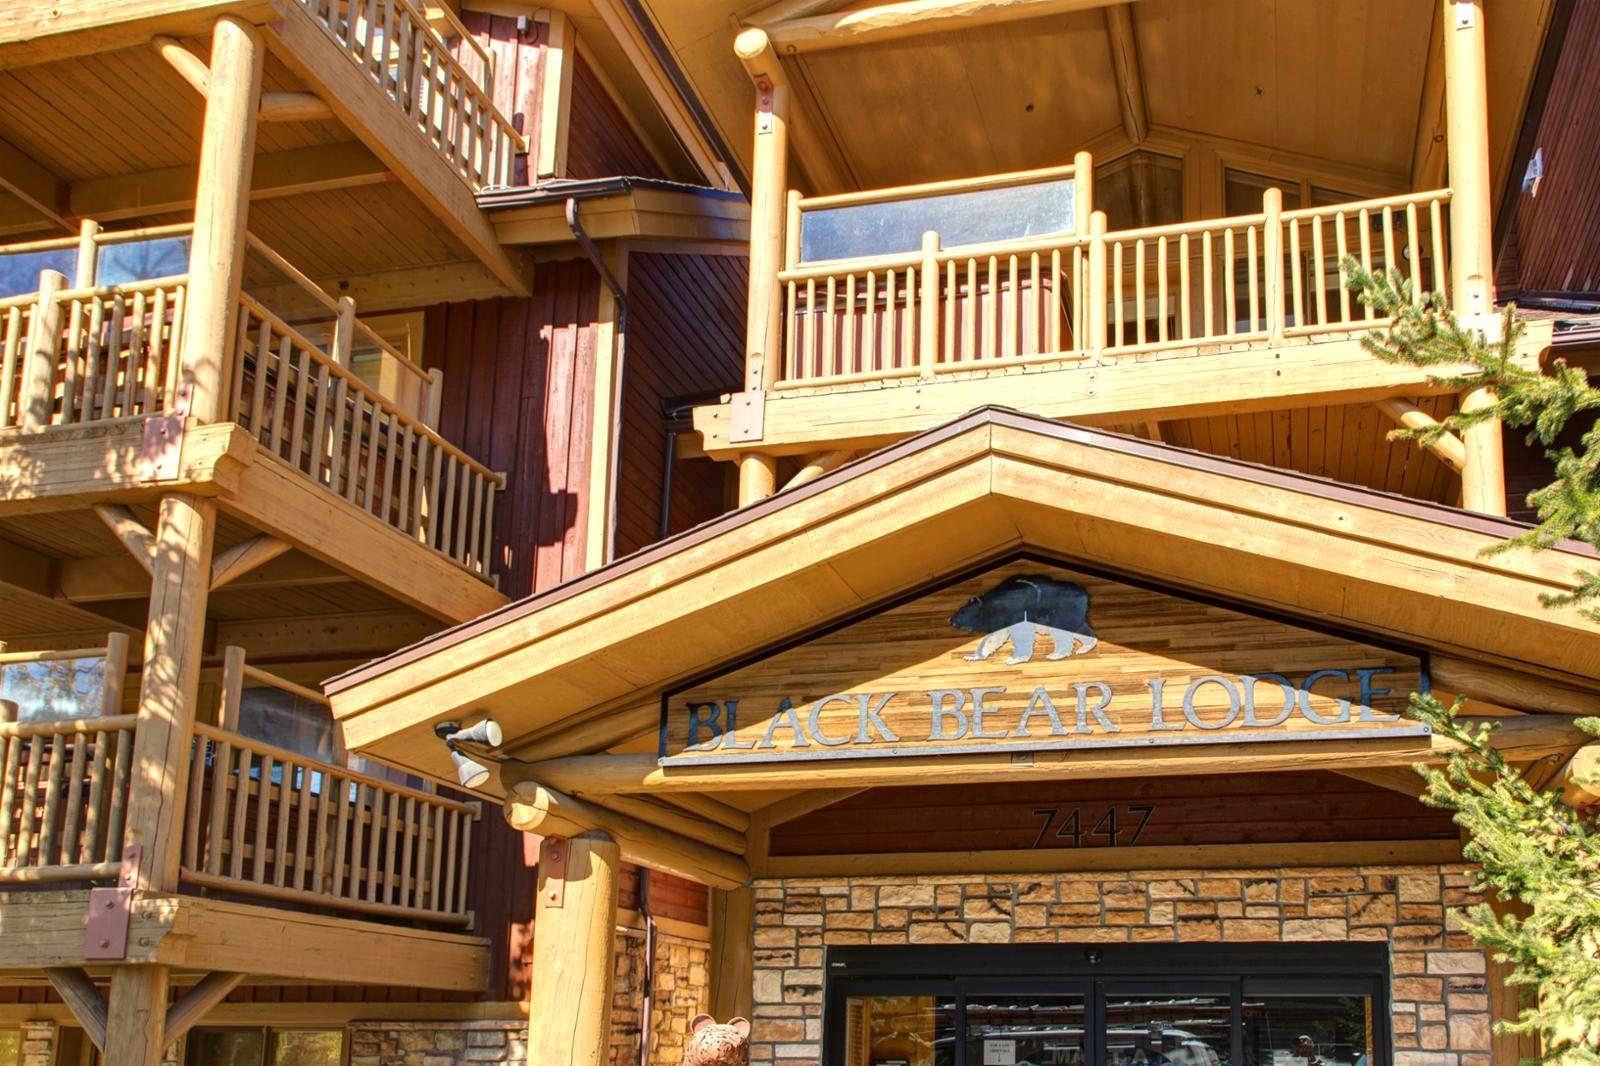 Black Bear Lodge Entrance